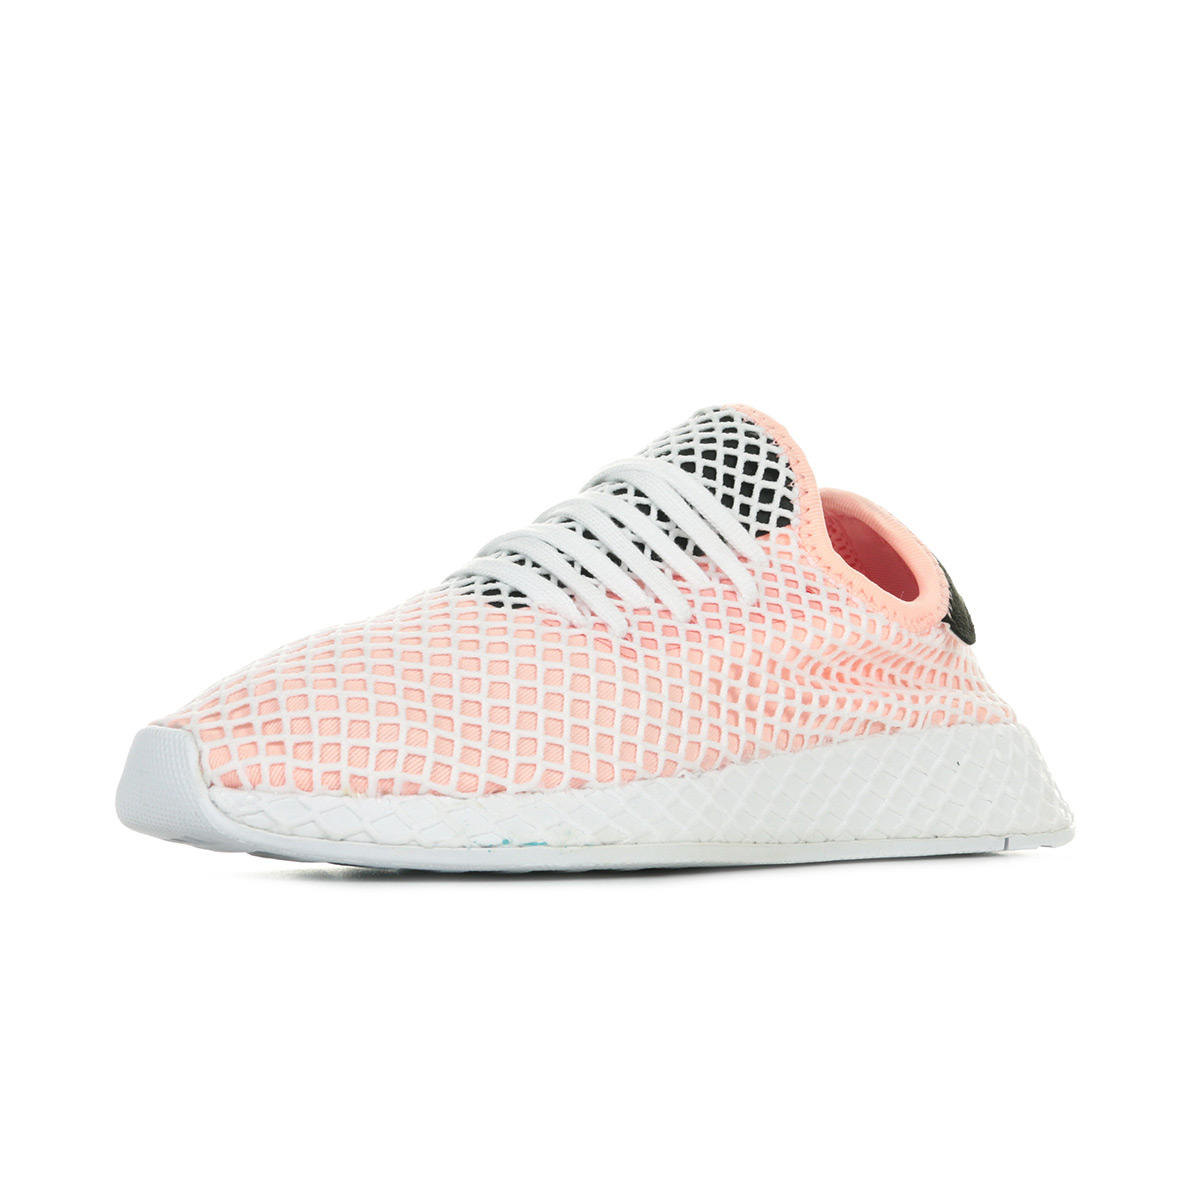 Détails sur Chaussures Baskets adidas femme Deerupt Runner taille Blanc Blanche Textile